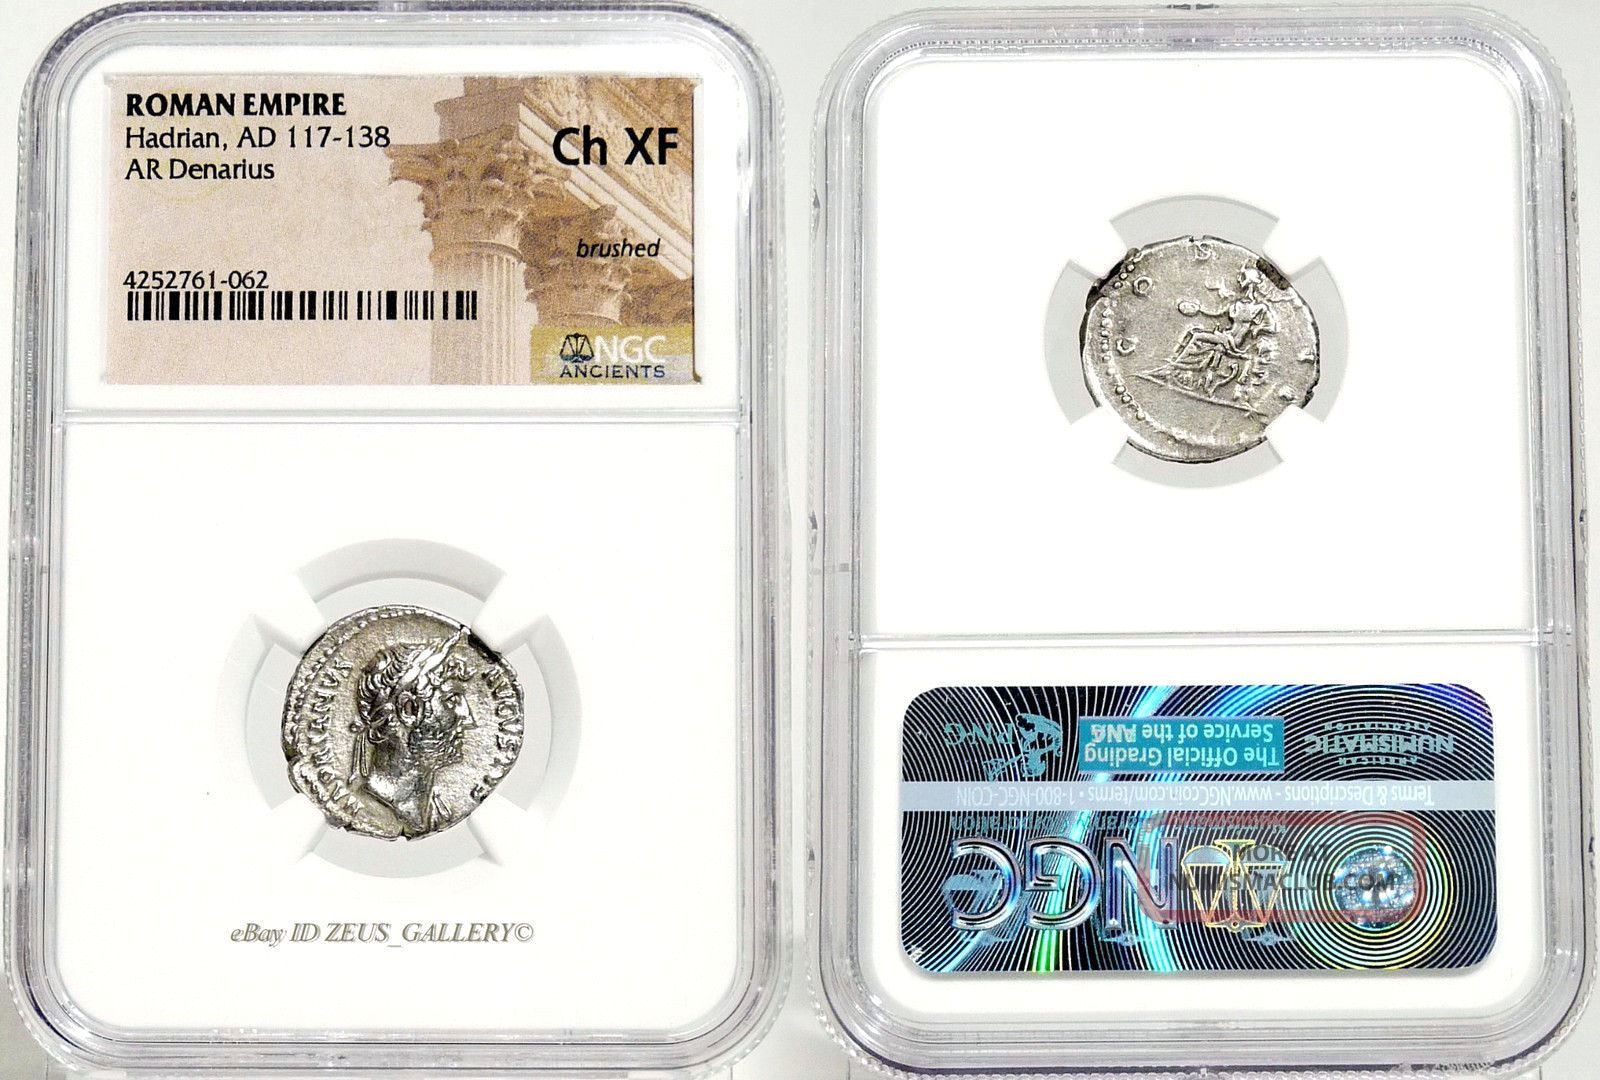 Hadrian Ngc Choice Xf Concordia Ancient Roman Empire Silver Denarius Coin Coins: Ancient photo